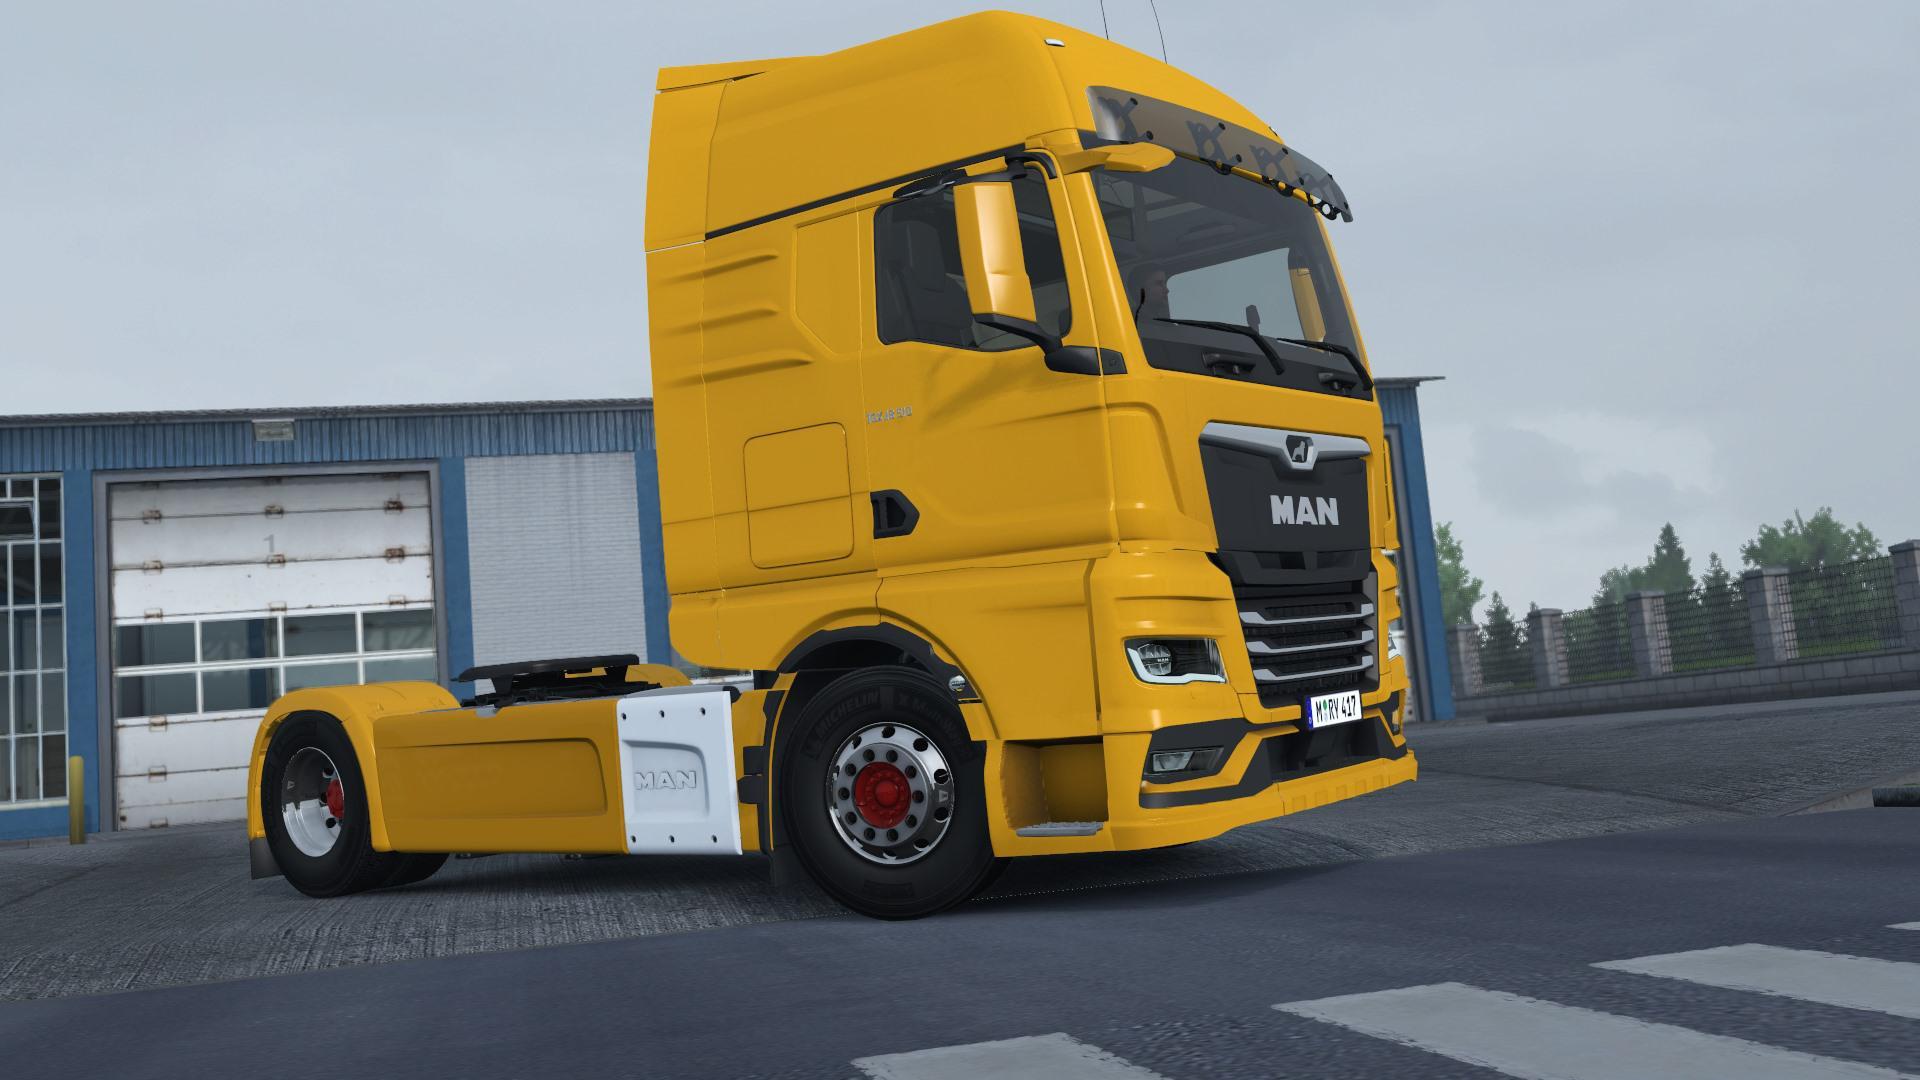 ETS2 - Man TGX 2020 Truck V1 (1.38.x)